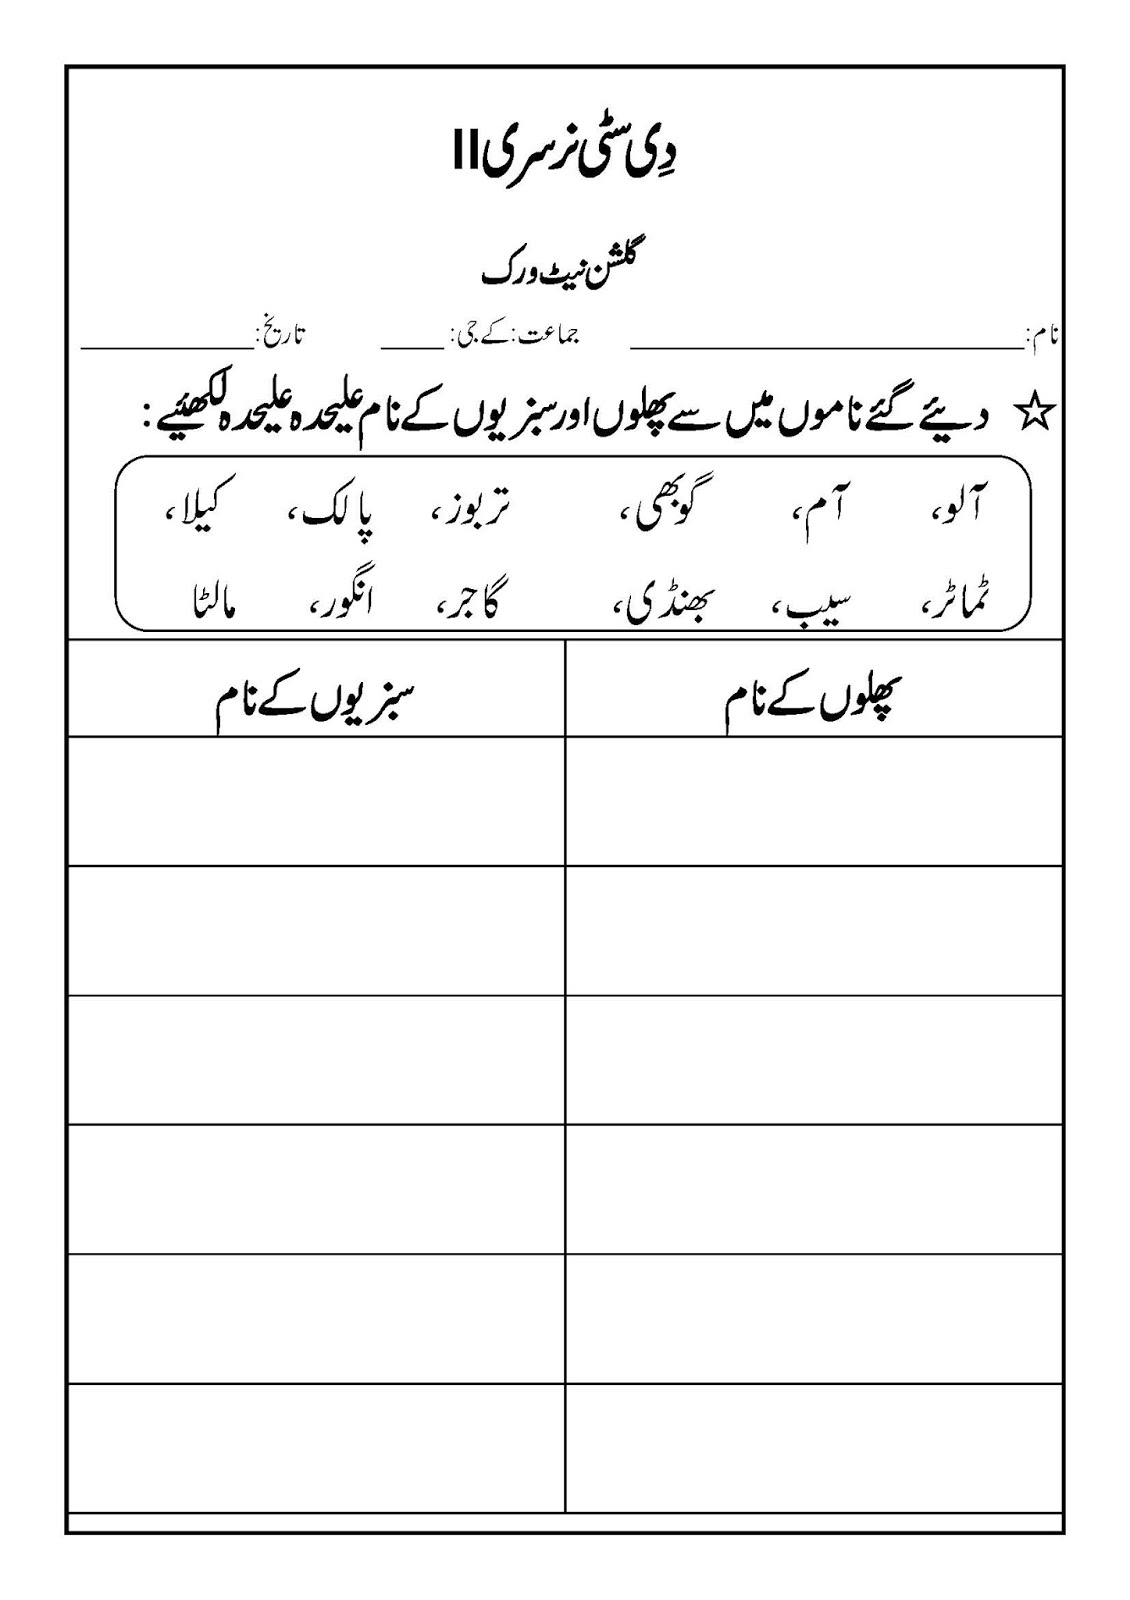 small resolution of Kalama In Urdu Of Worksheet   Printable Worksheets and Activities for  Teachers